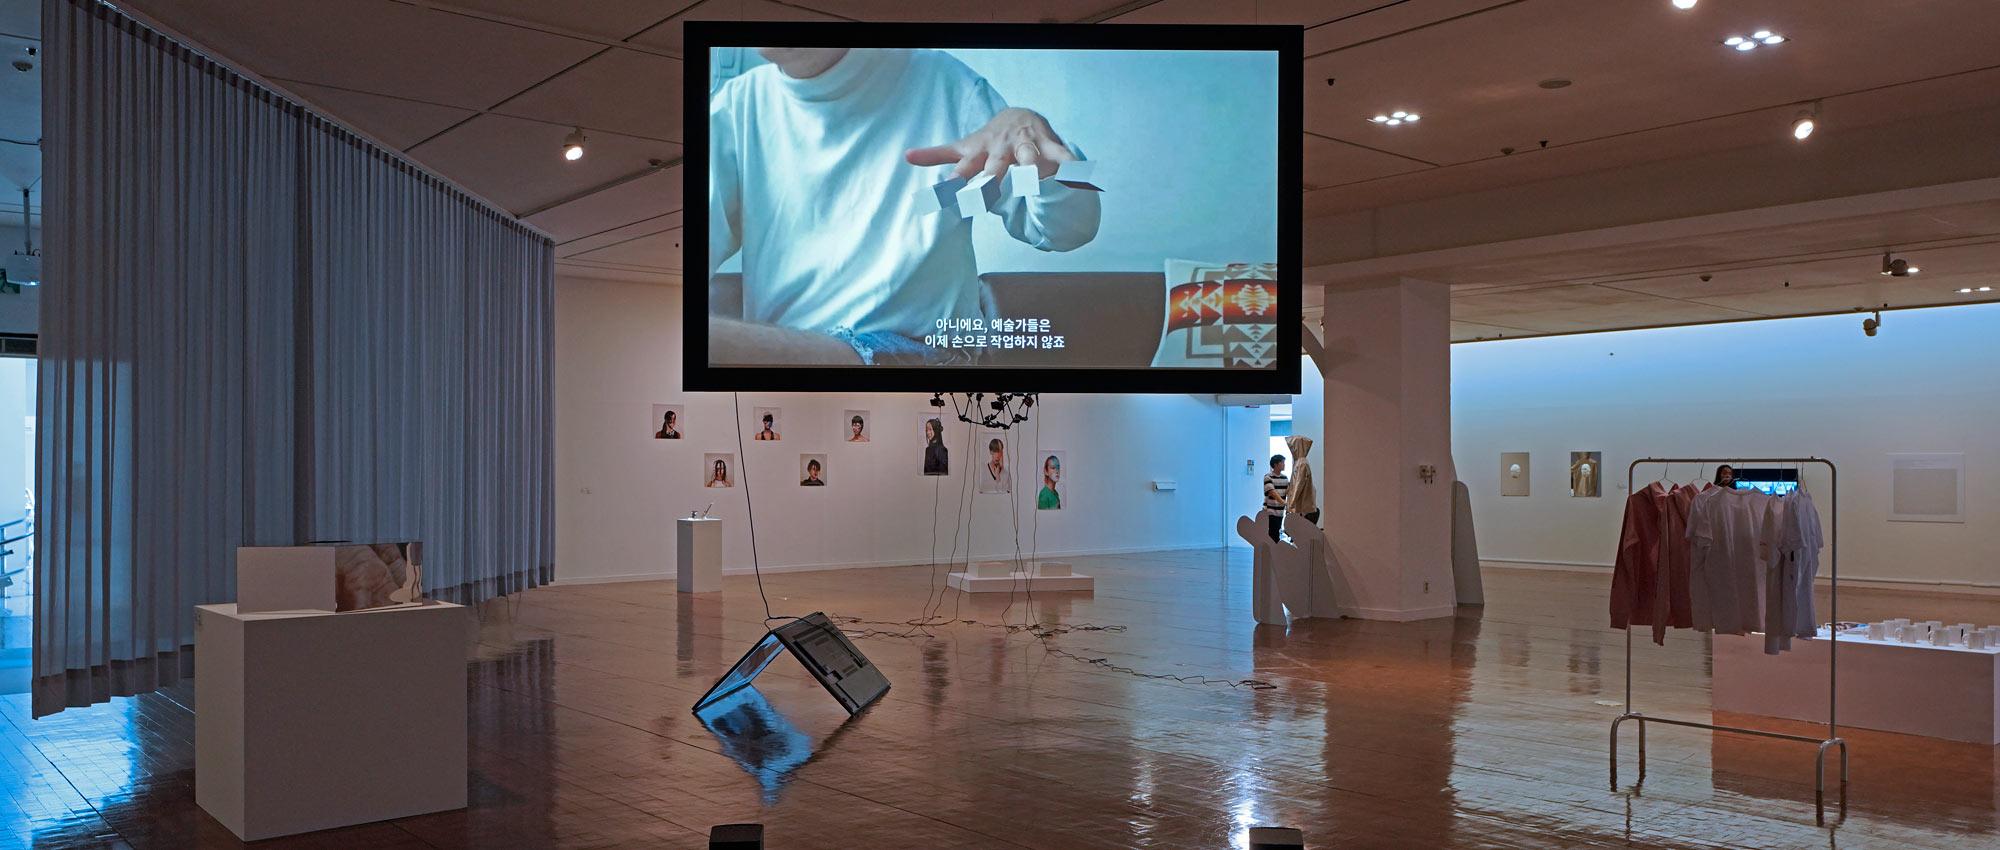 Seoul Mediacity Biennale 2018